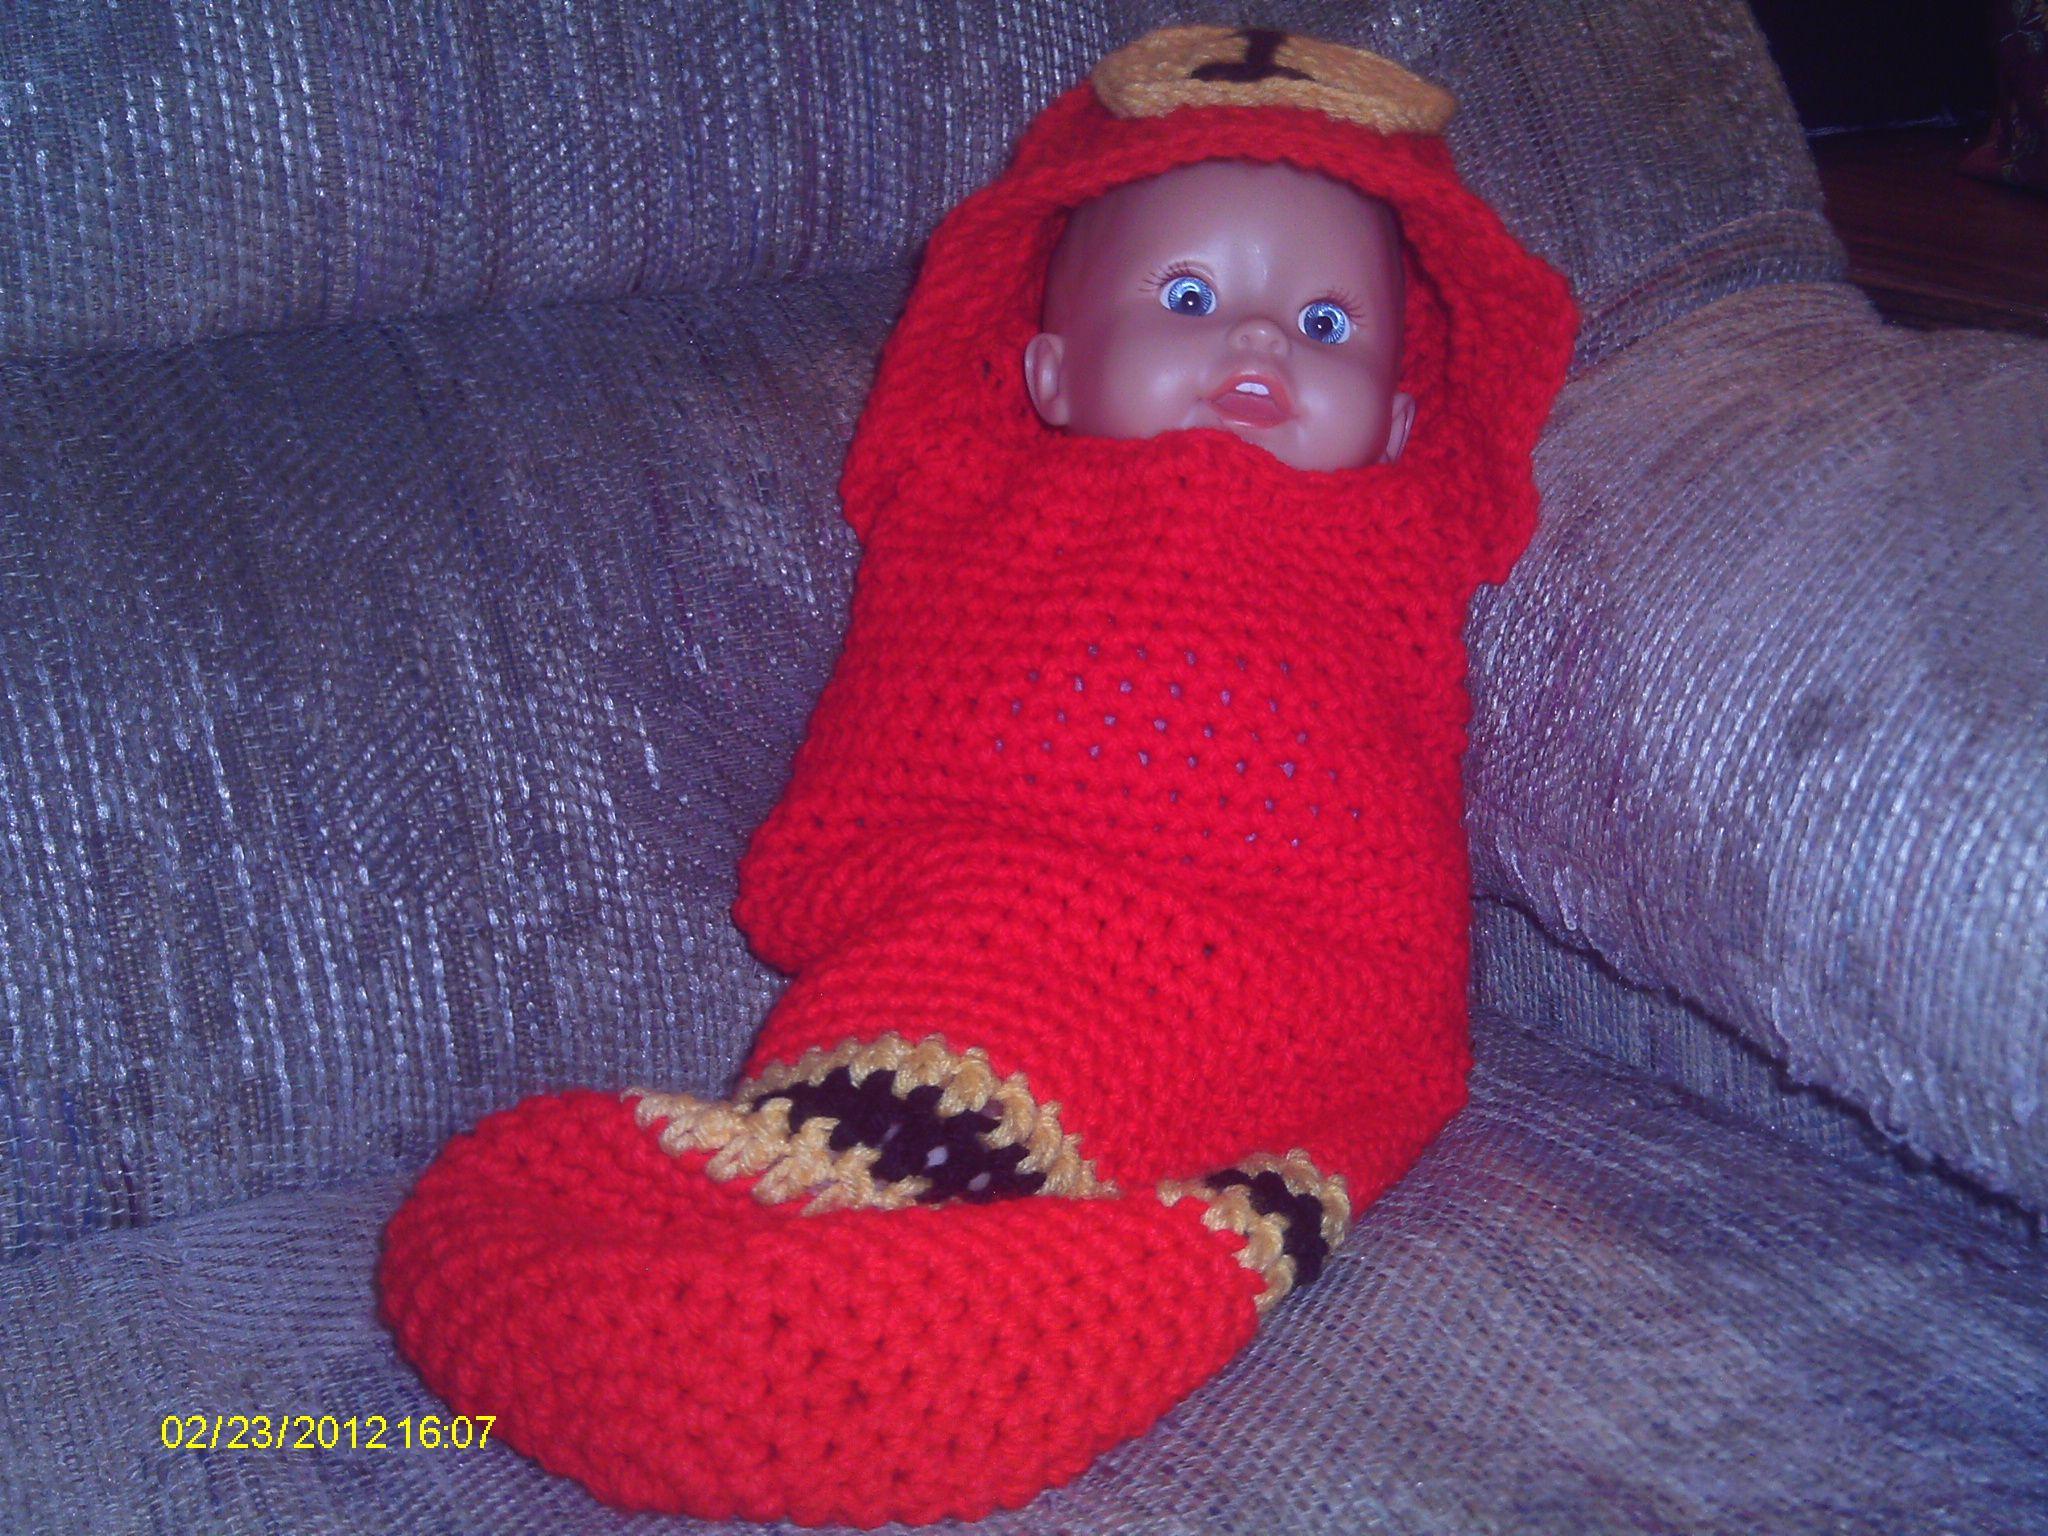 Crochet Fireman Newborn cocoon. | Crochet Baby Cocoon | Pinterest